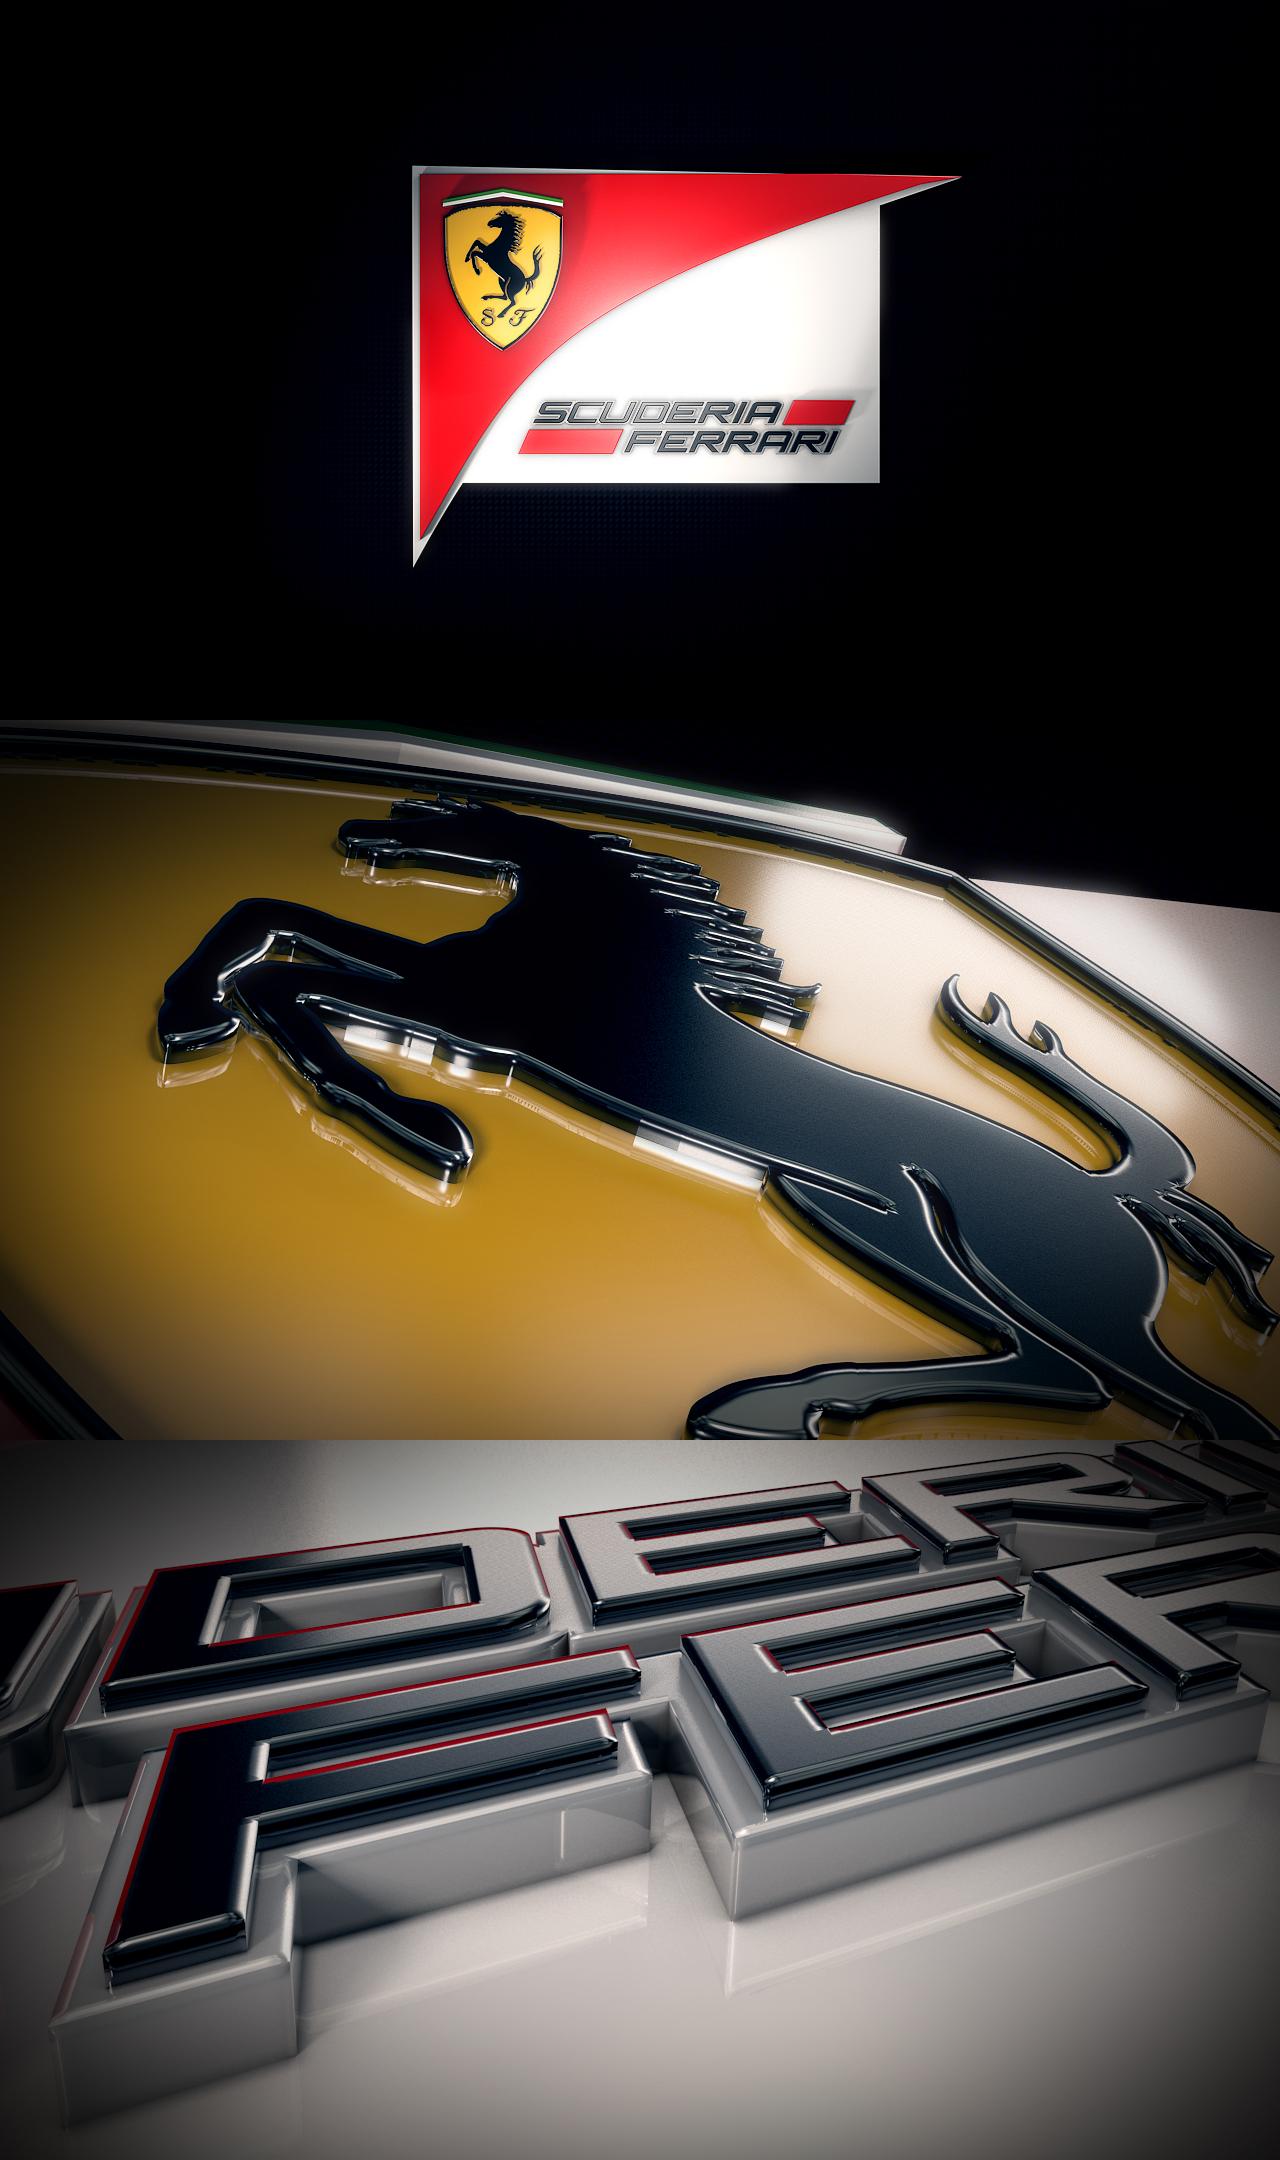 3 frames from the Ferrari team logo render. No post work.